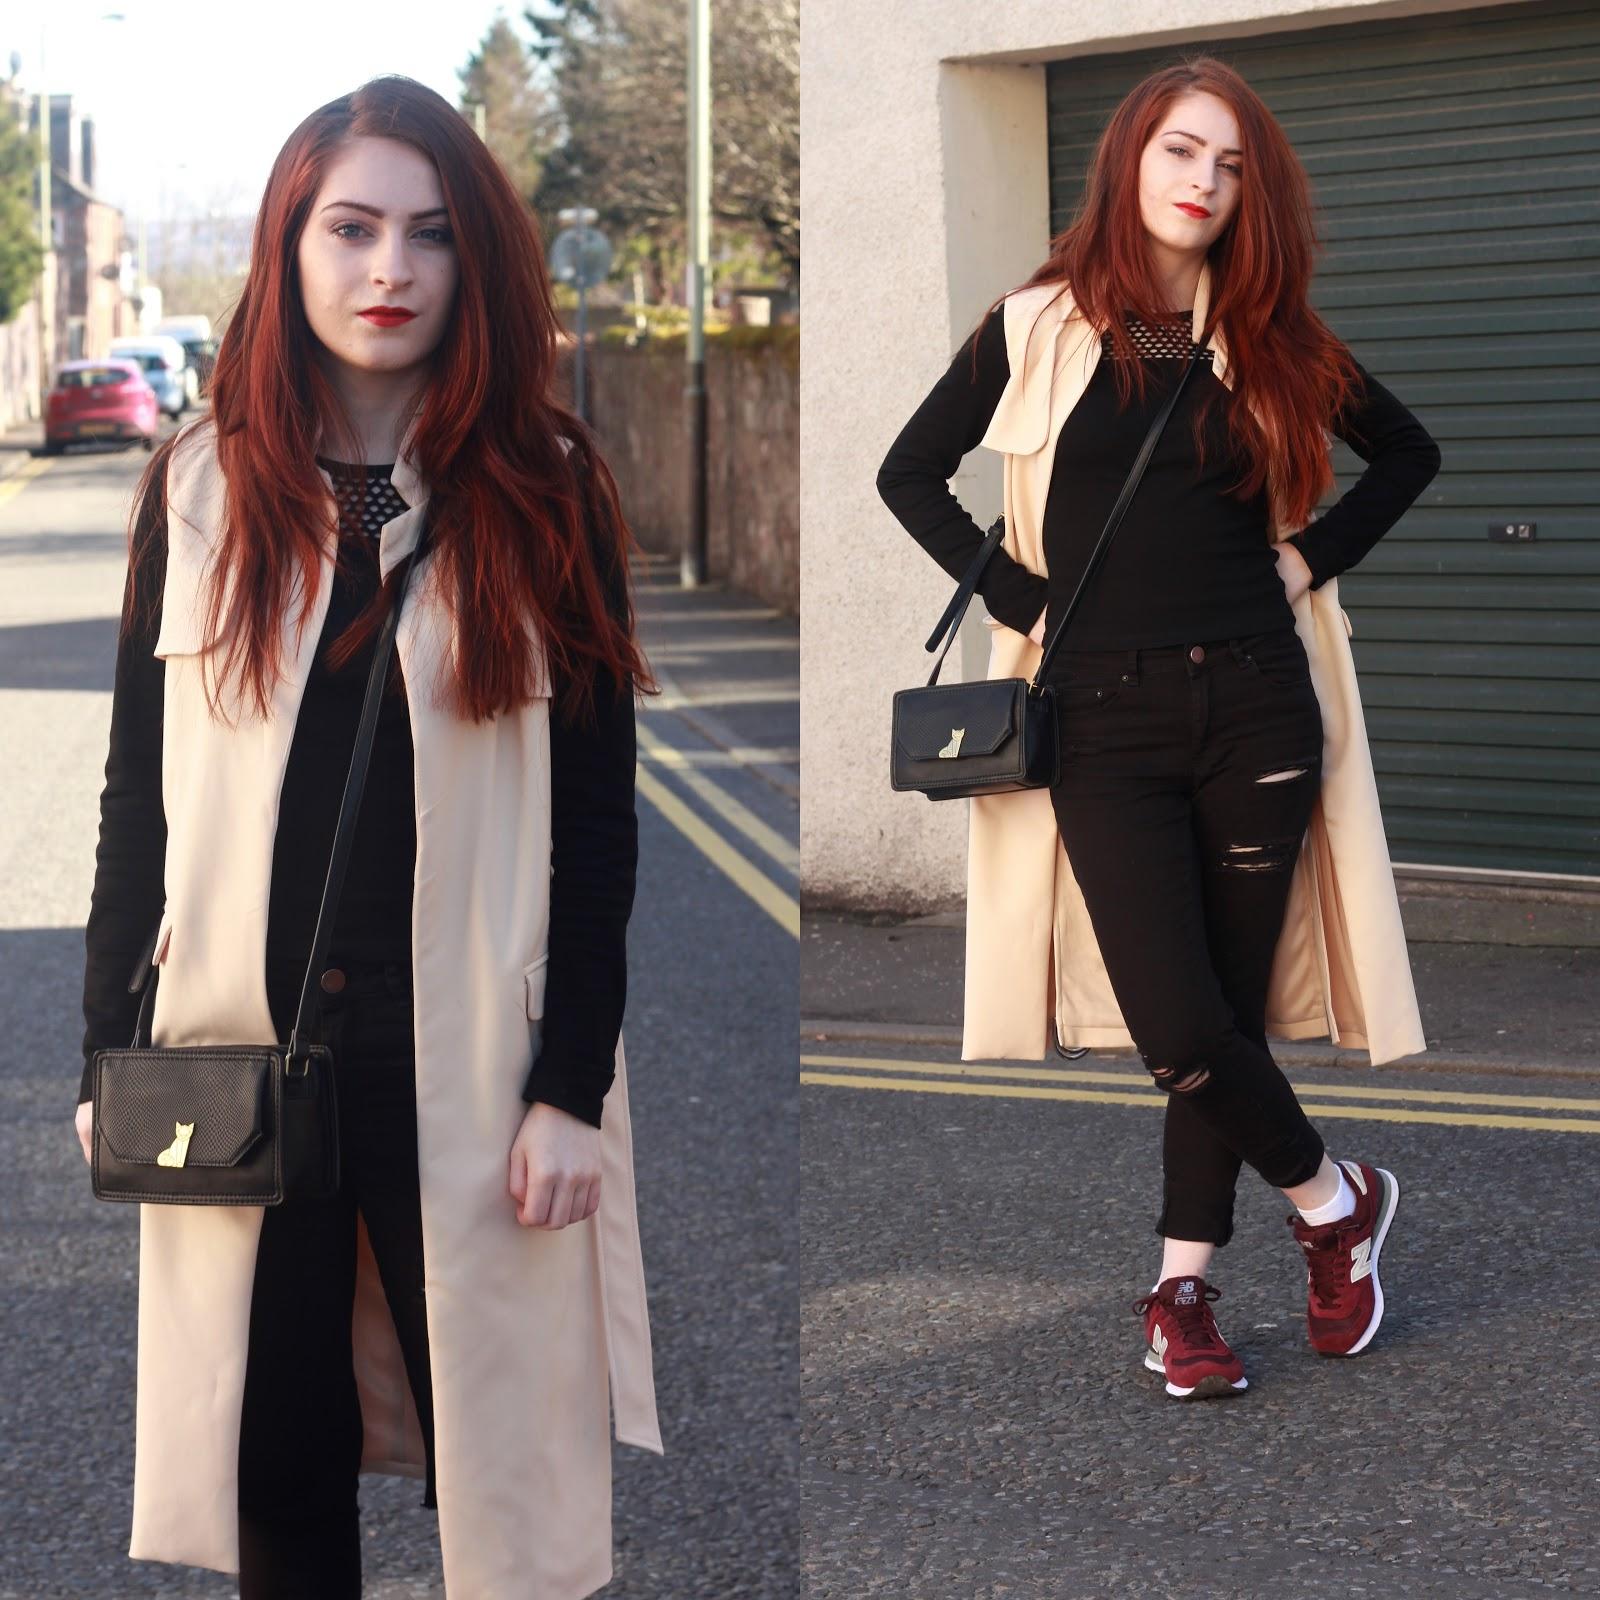 krystel couture, fashion blog, style blog, lavish alice, new balance, nica handbags,